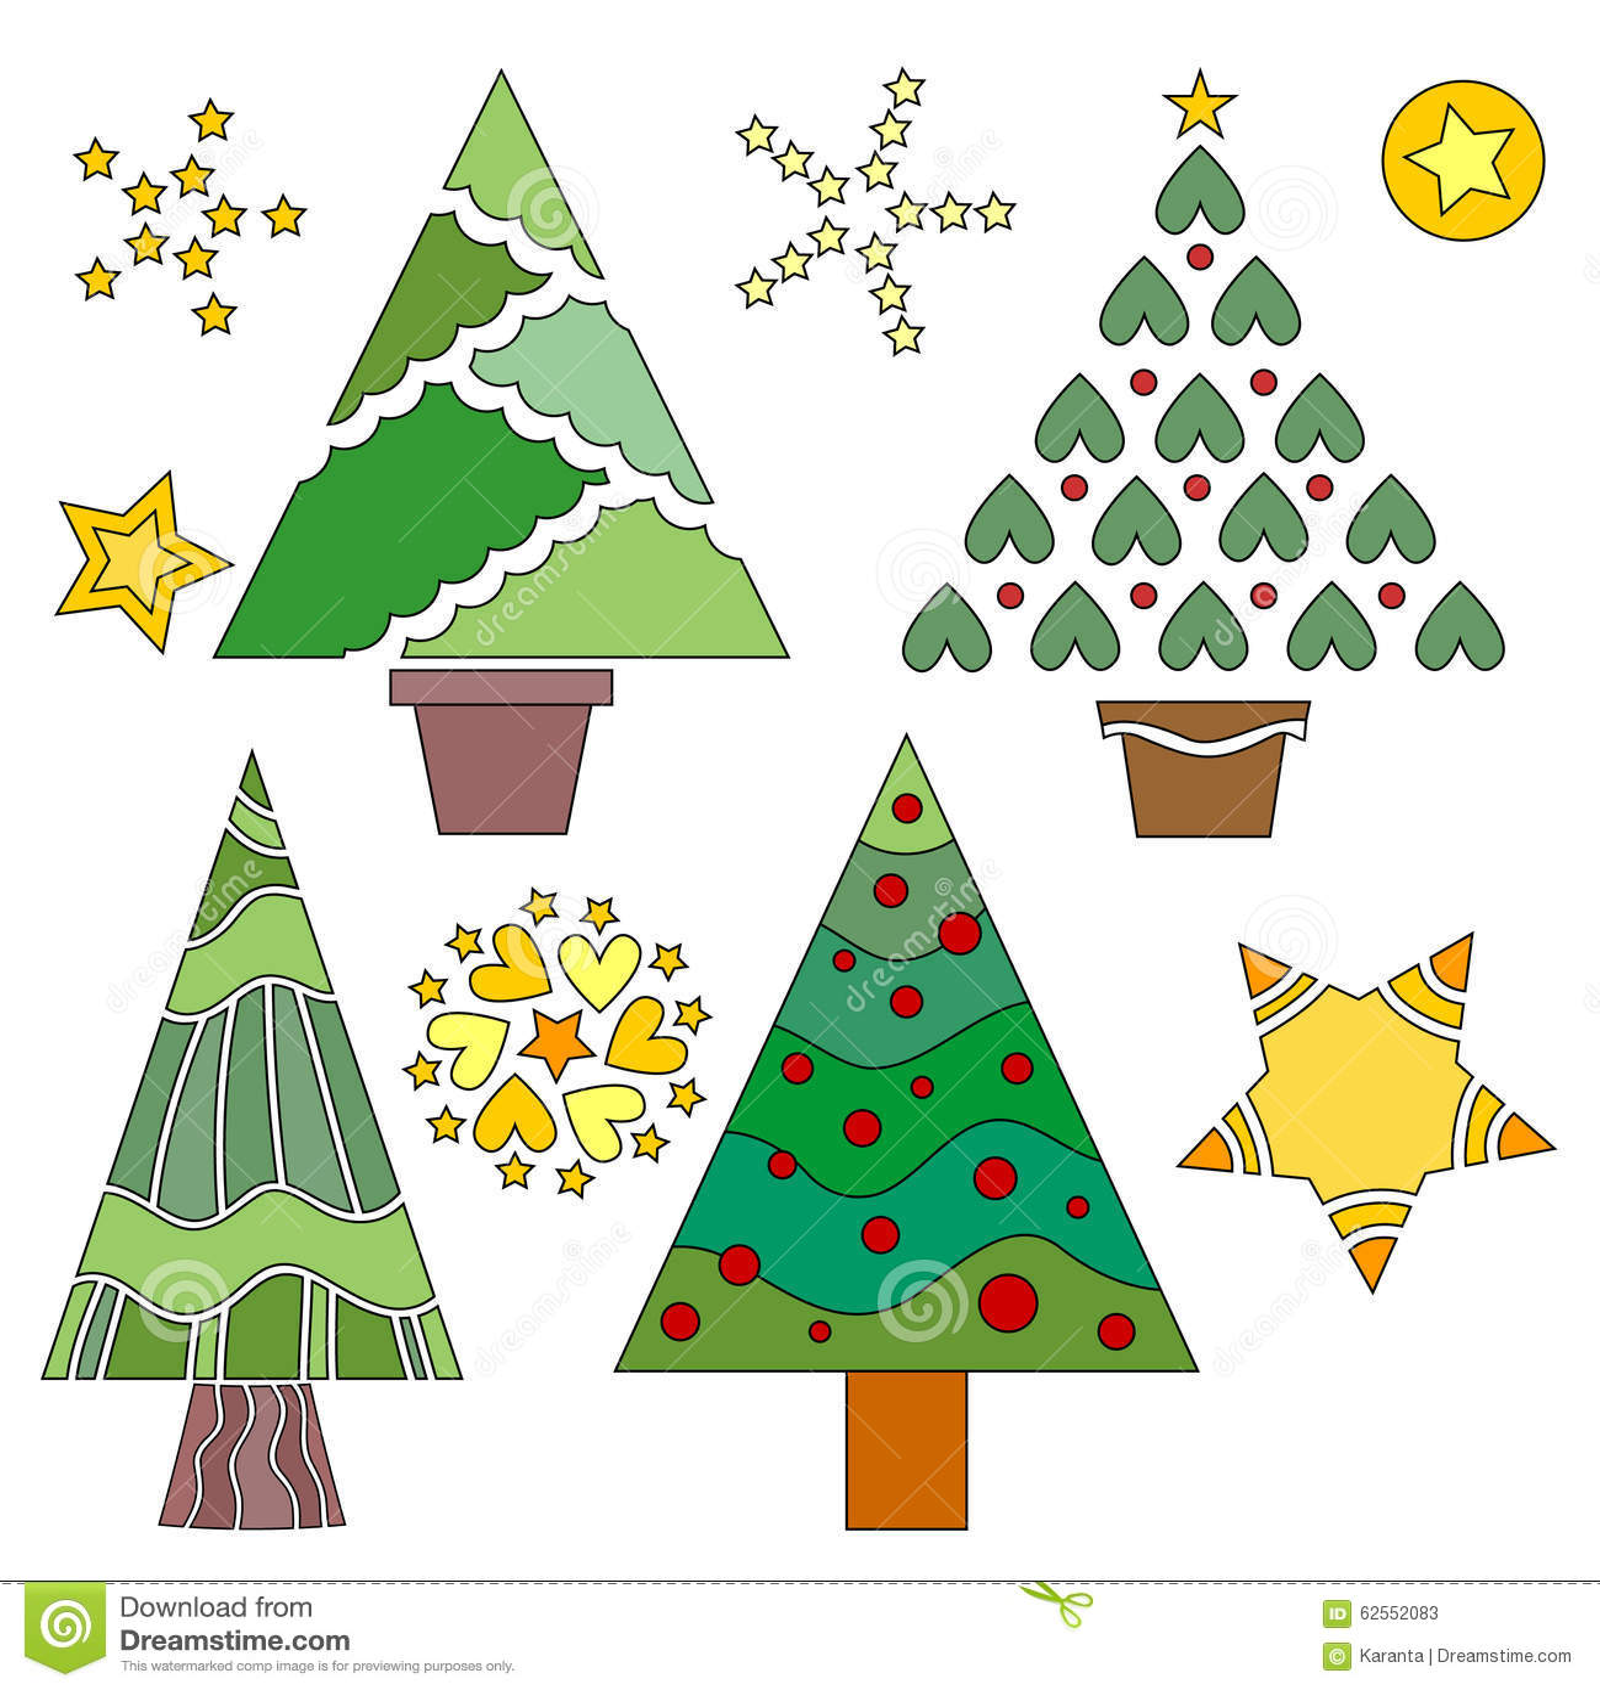 Christmas Tree Collection Trowbridge : Christmas tree and star collection stock vector image